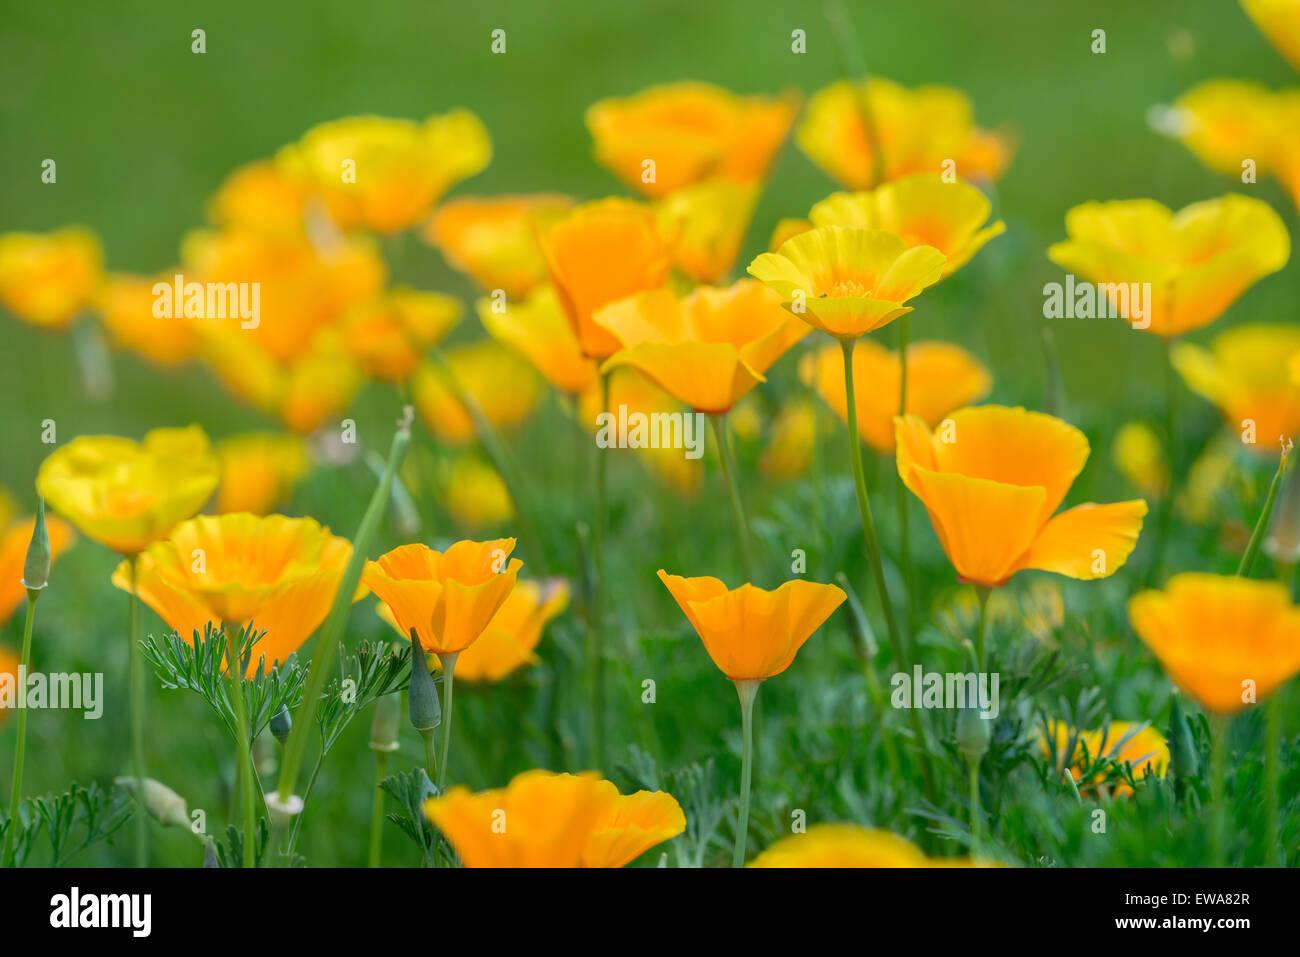 Eschscholzia californica California poppy, poppies,Californian poppy,golden poppy, California sunlight, cup of gold - Stock Image